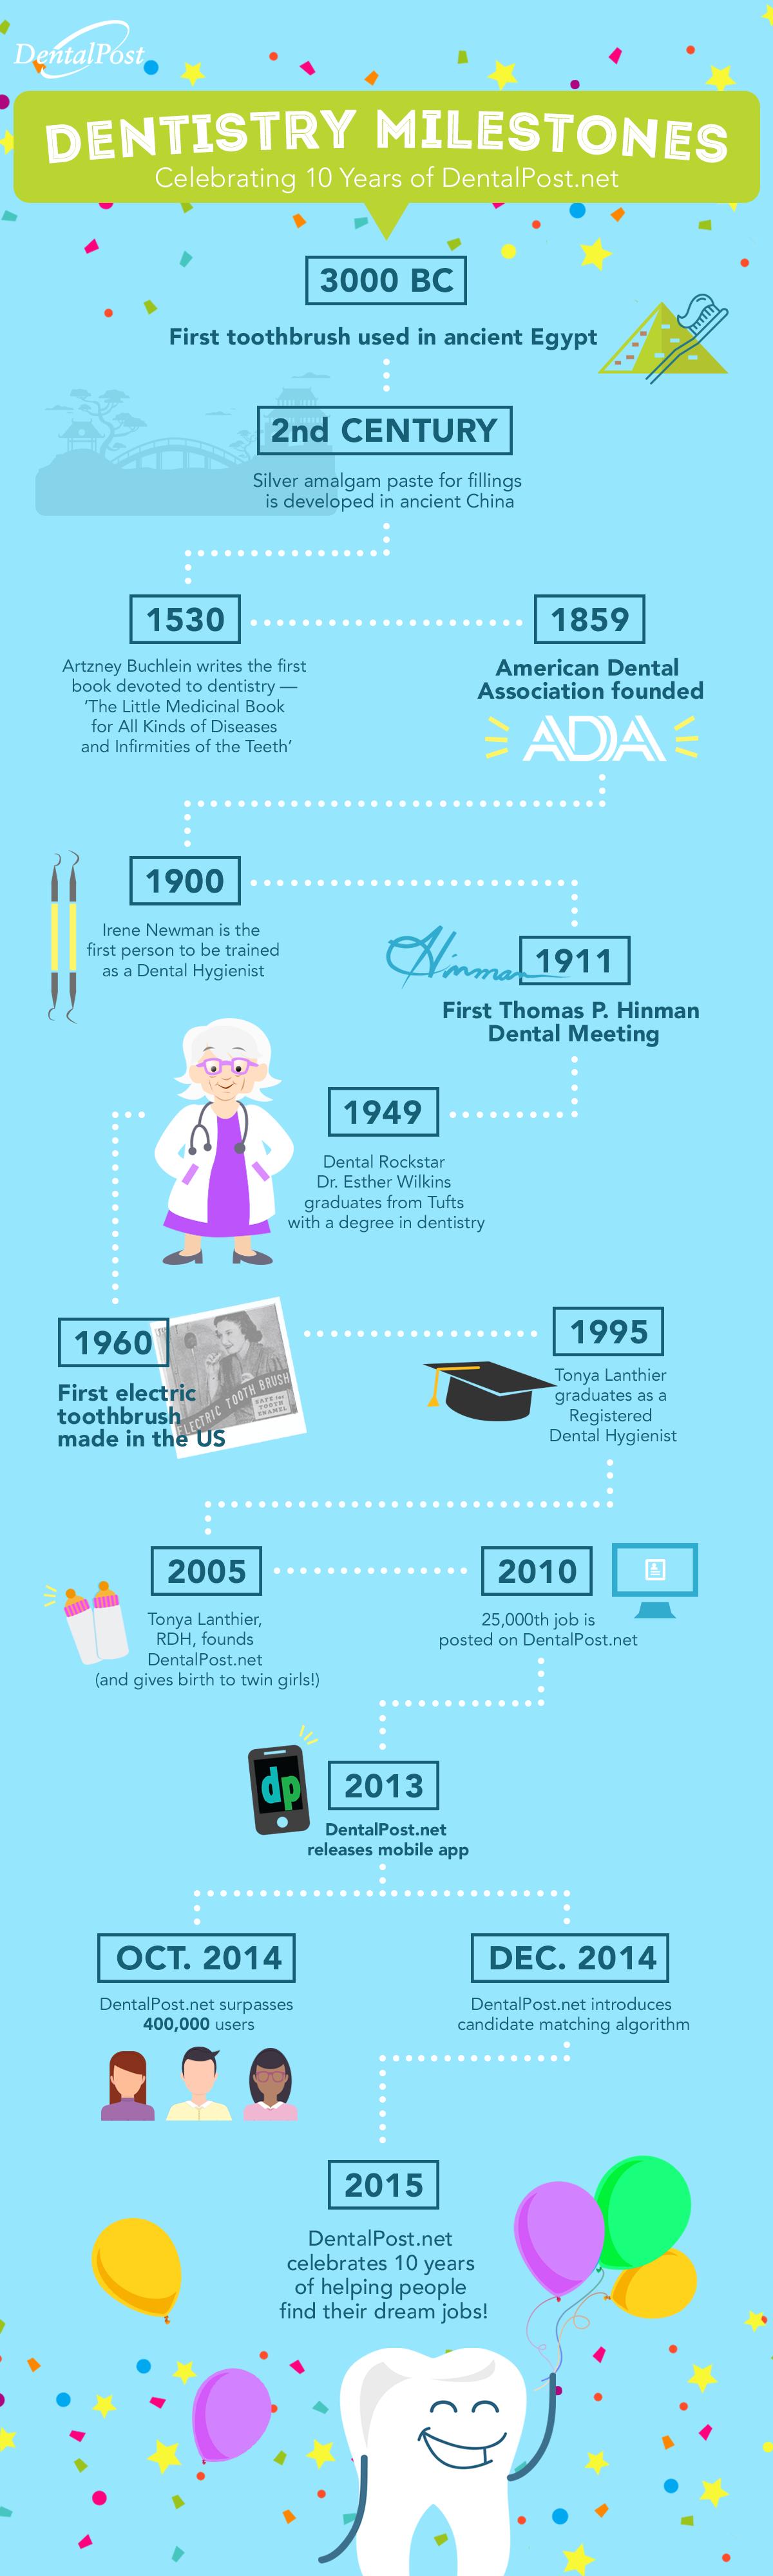 dentalpost.net dentistry milestones timeline infographic